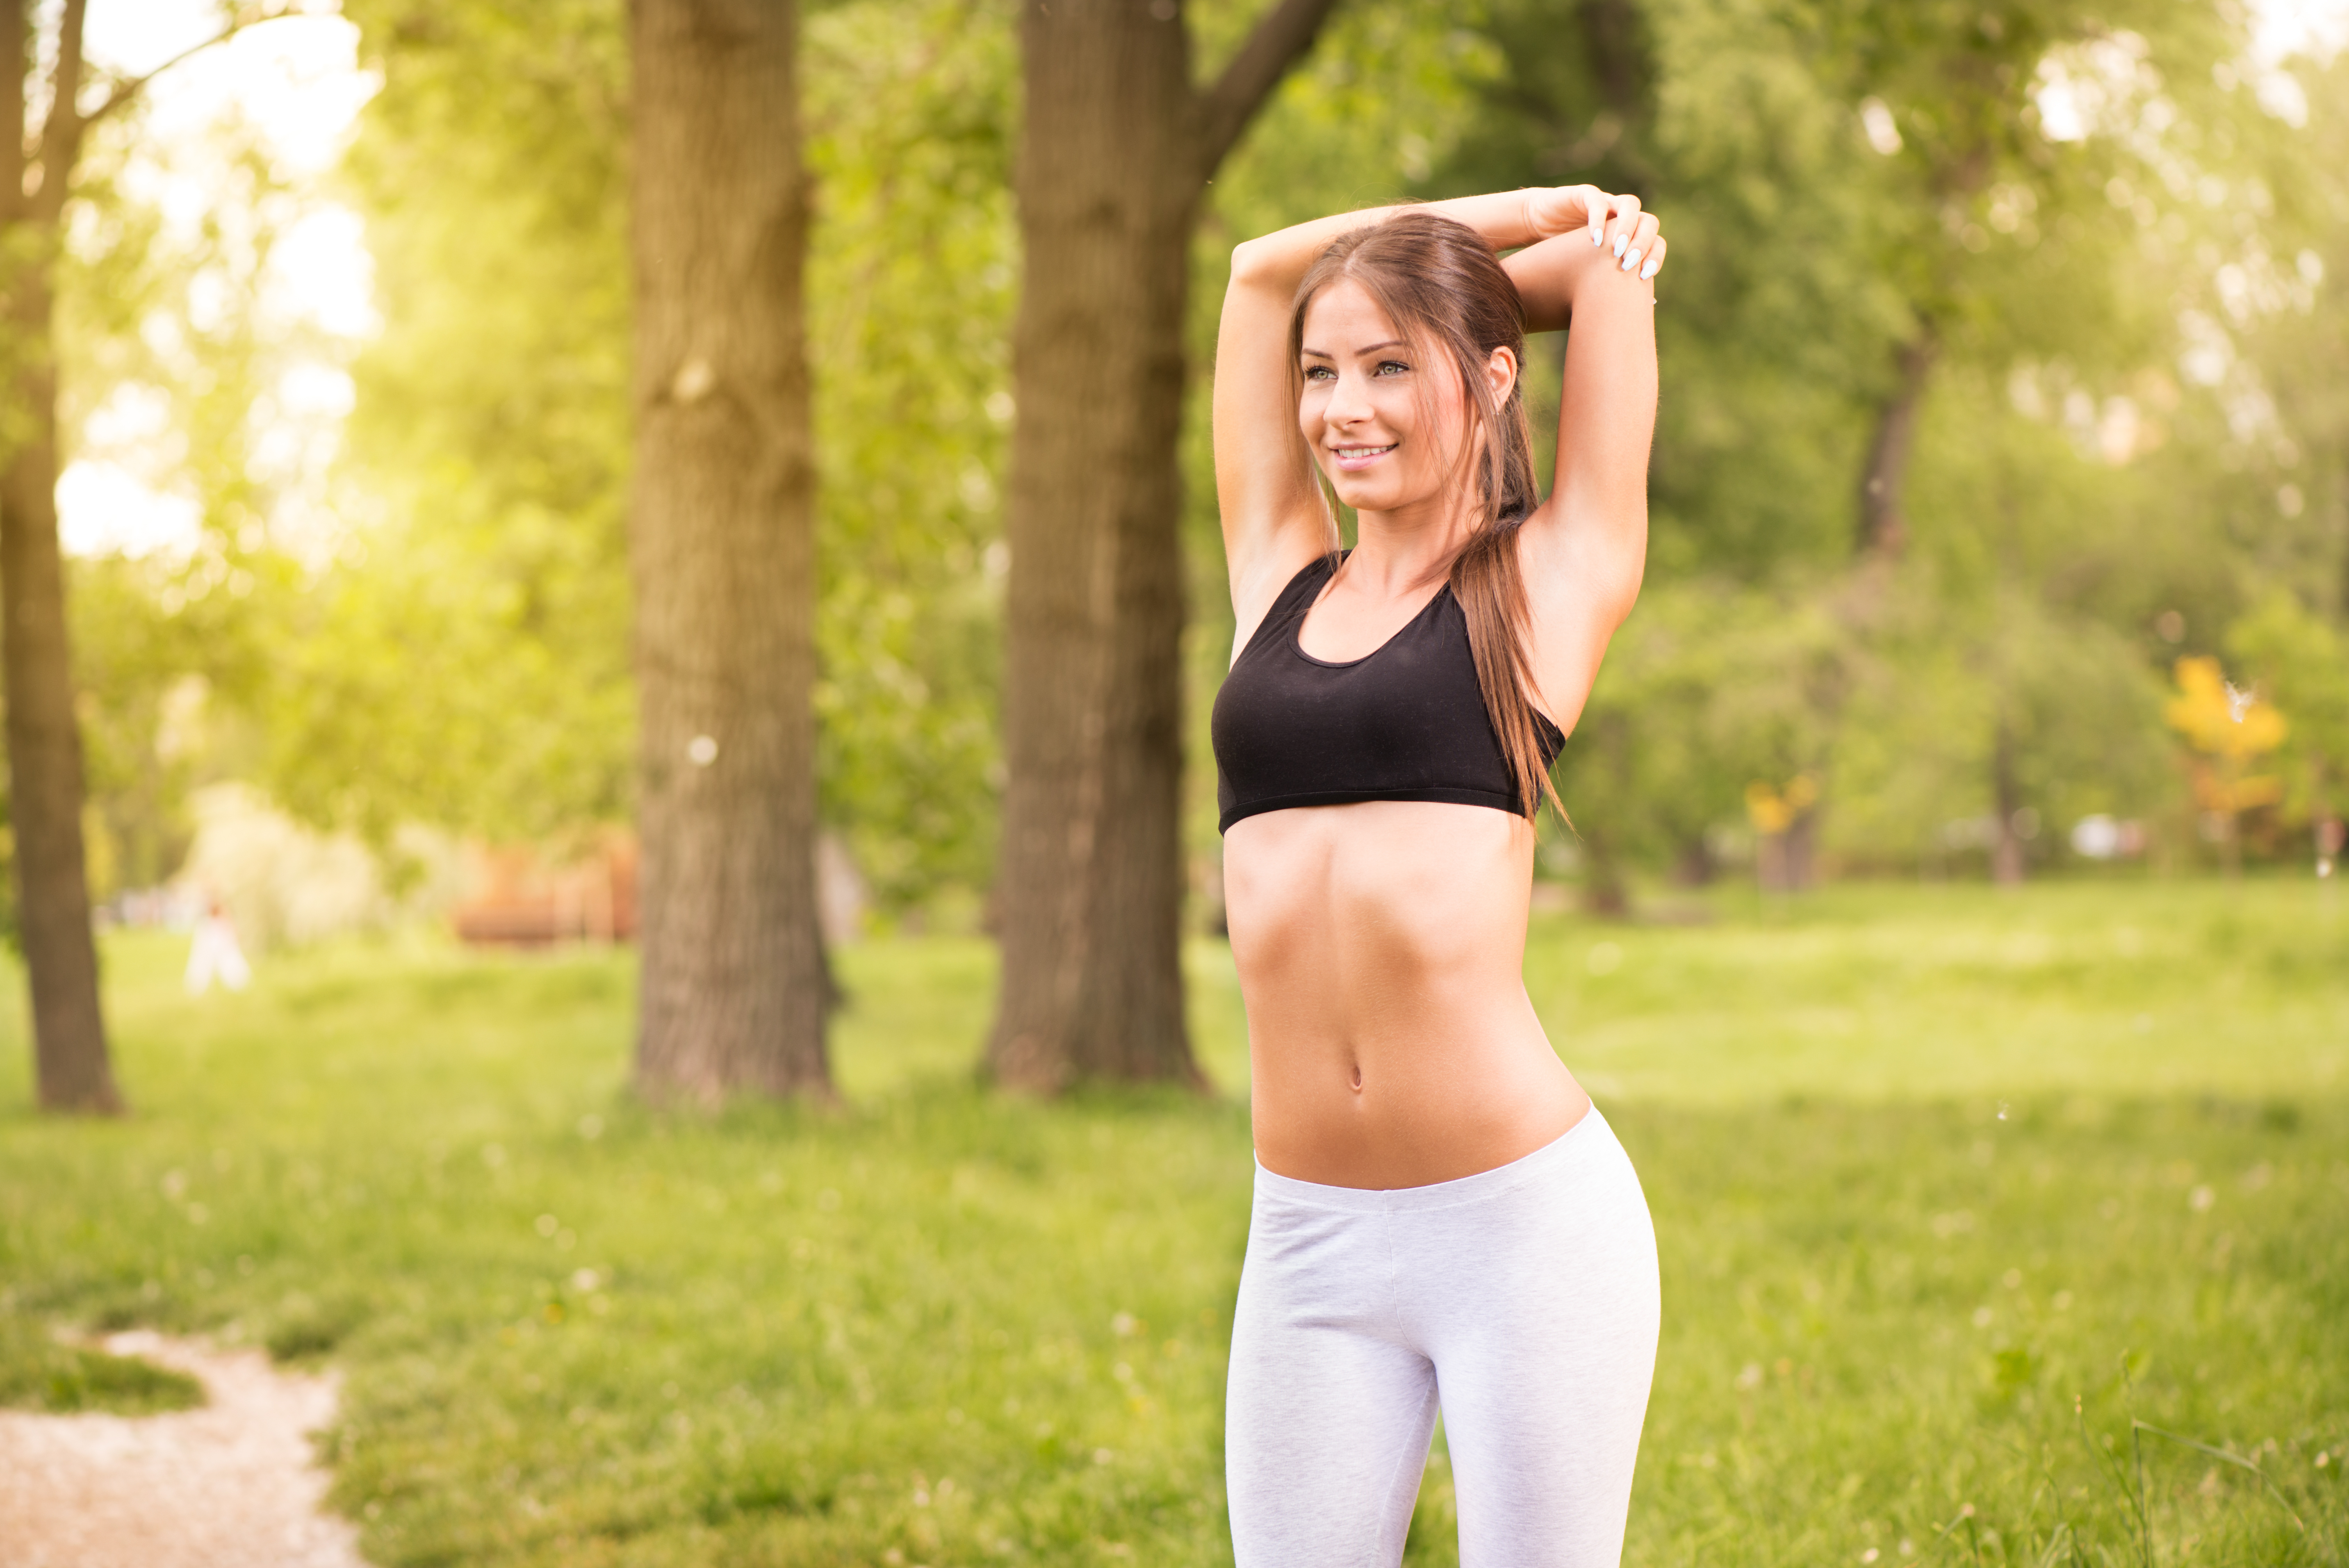 Chest and abdomen stretch